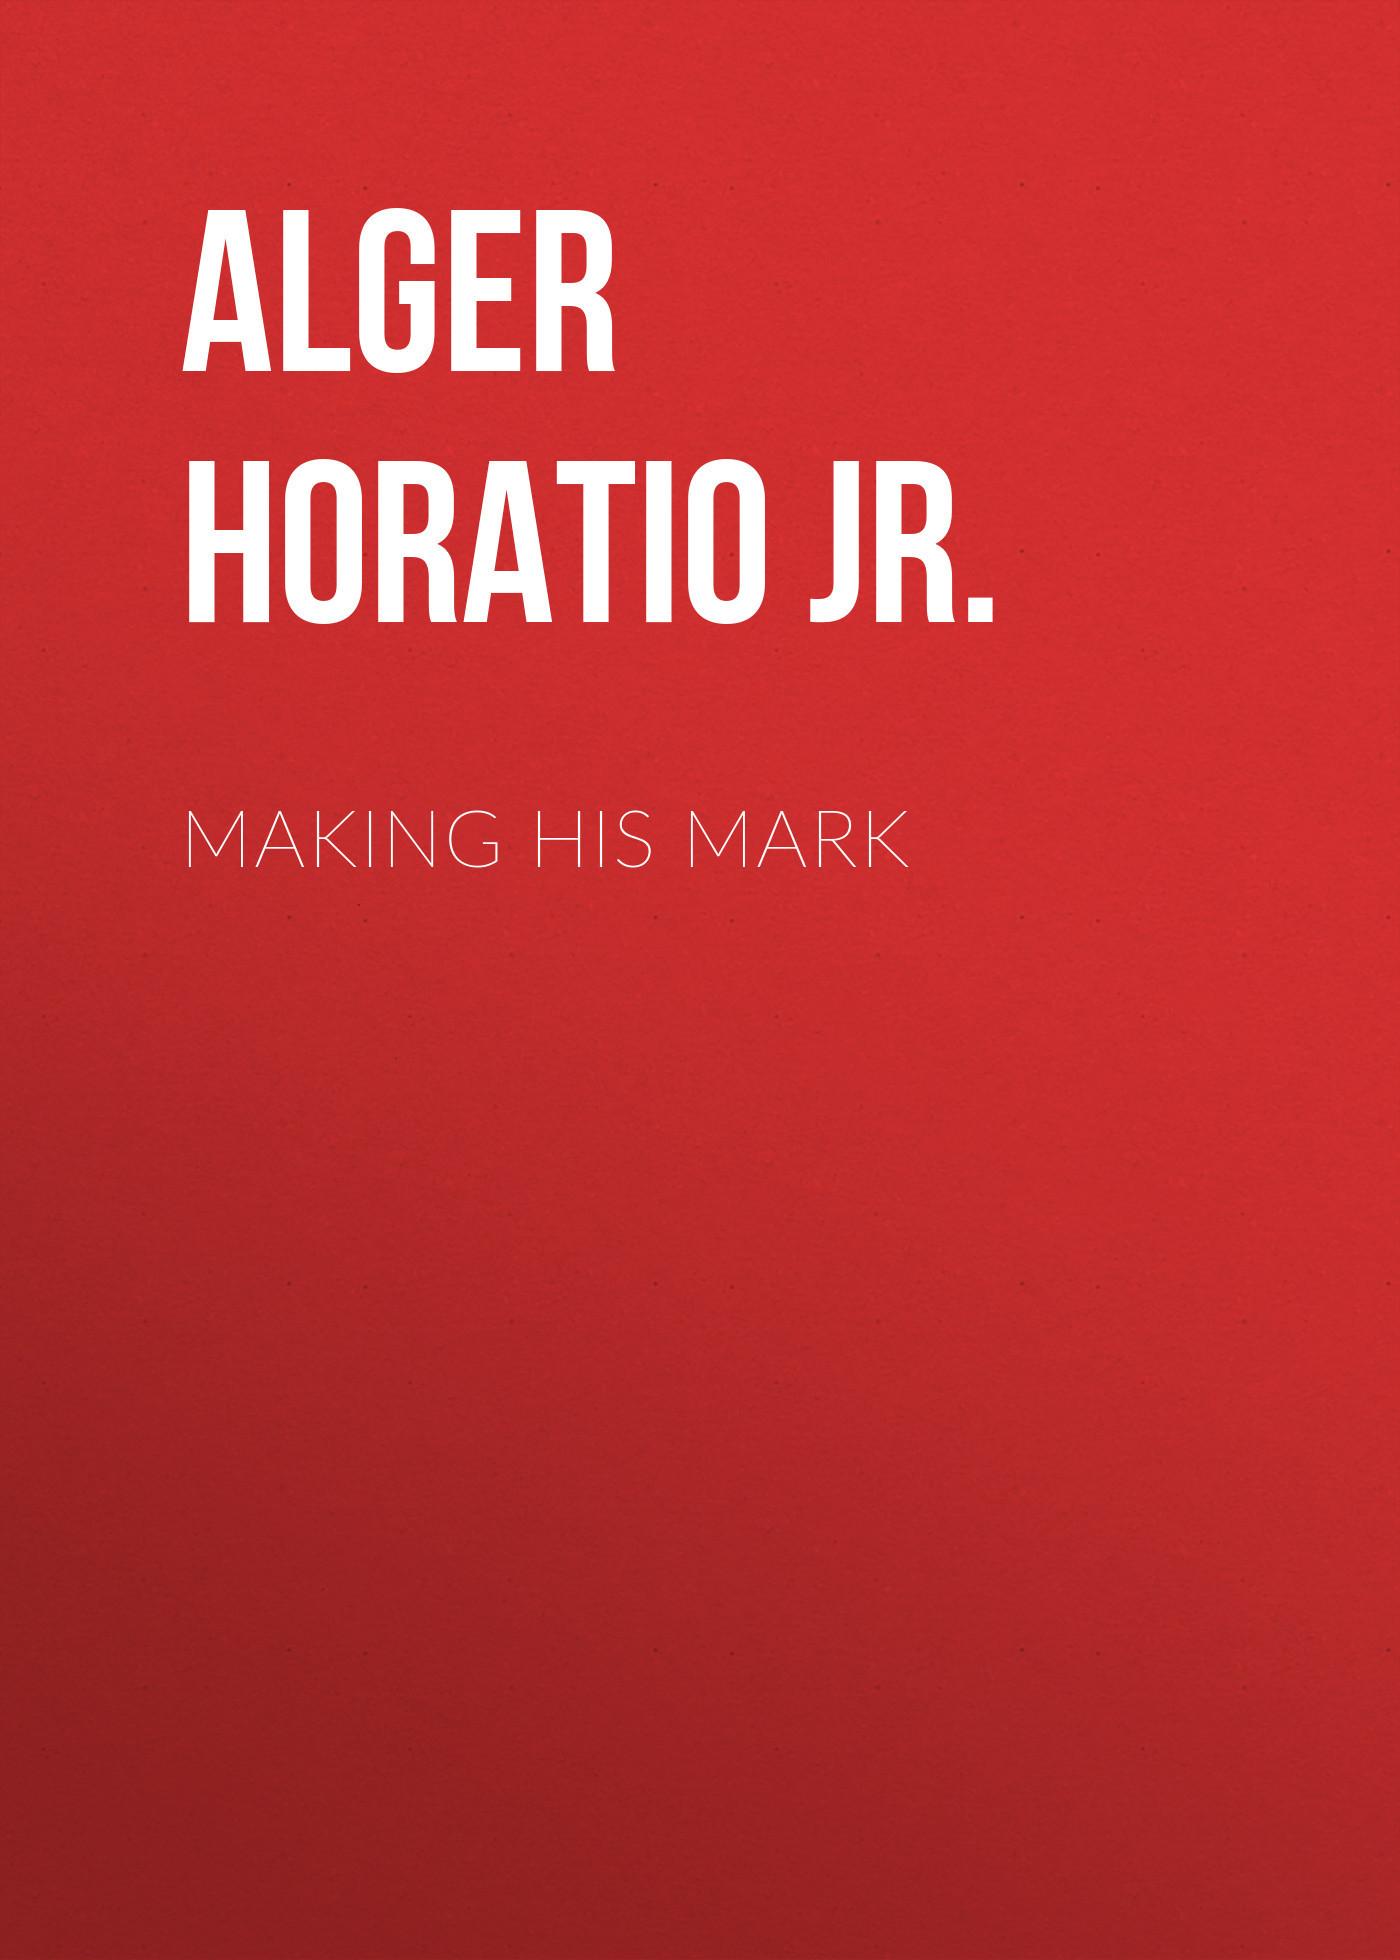 Alger Horatio Jr. Making His Mark box making